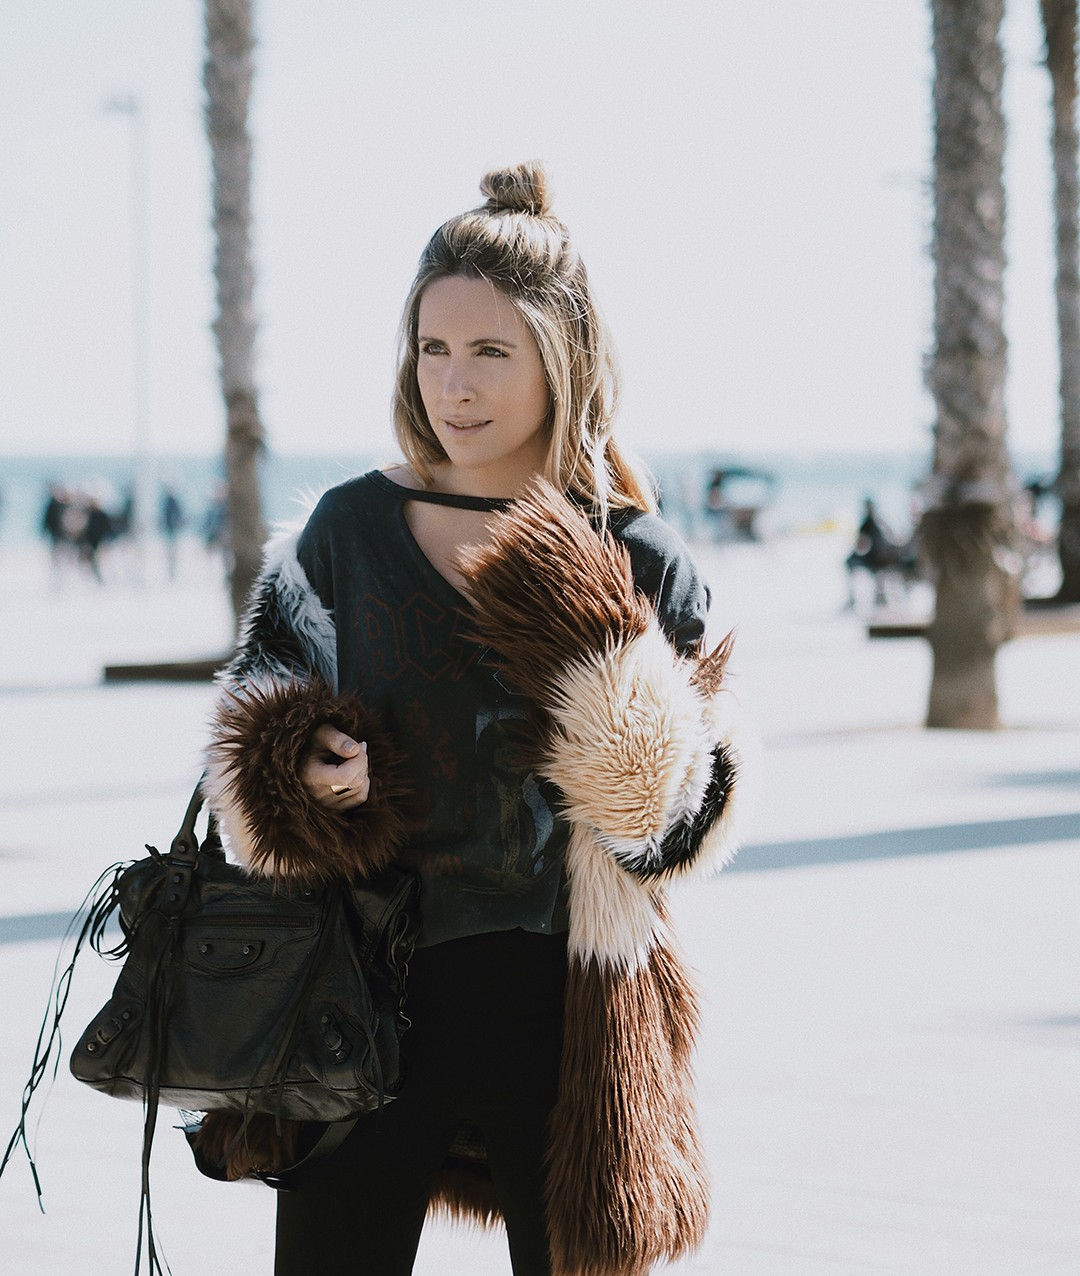 choker-tee-street-style-2017-fashion-blogger-Barcelona